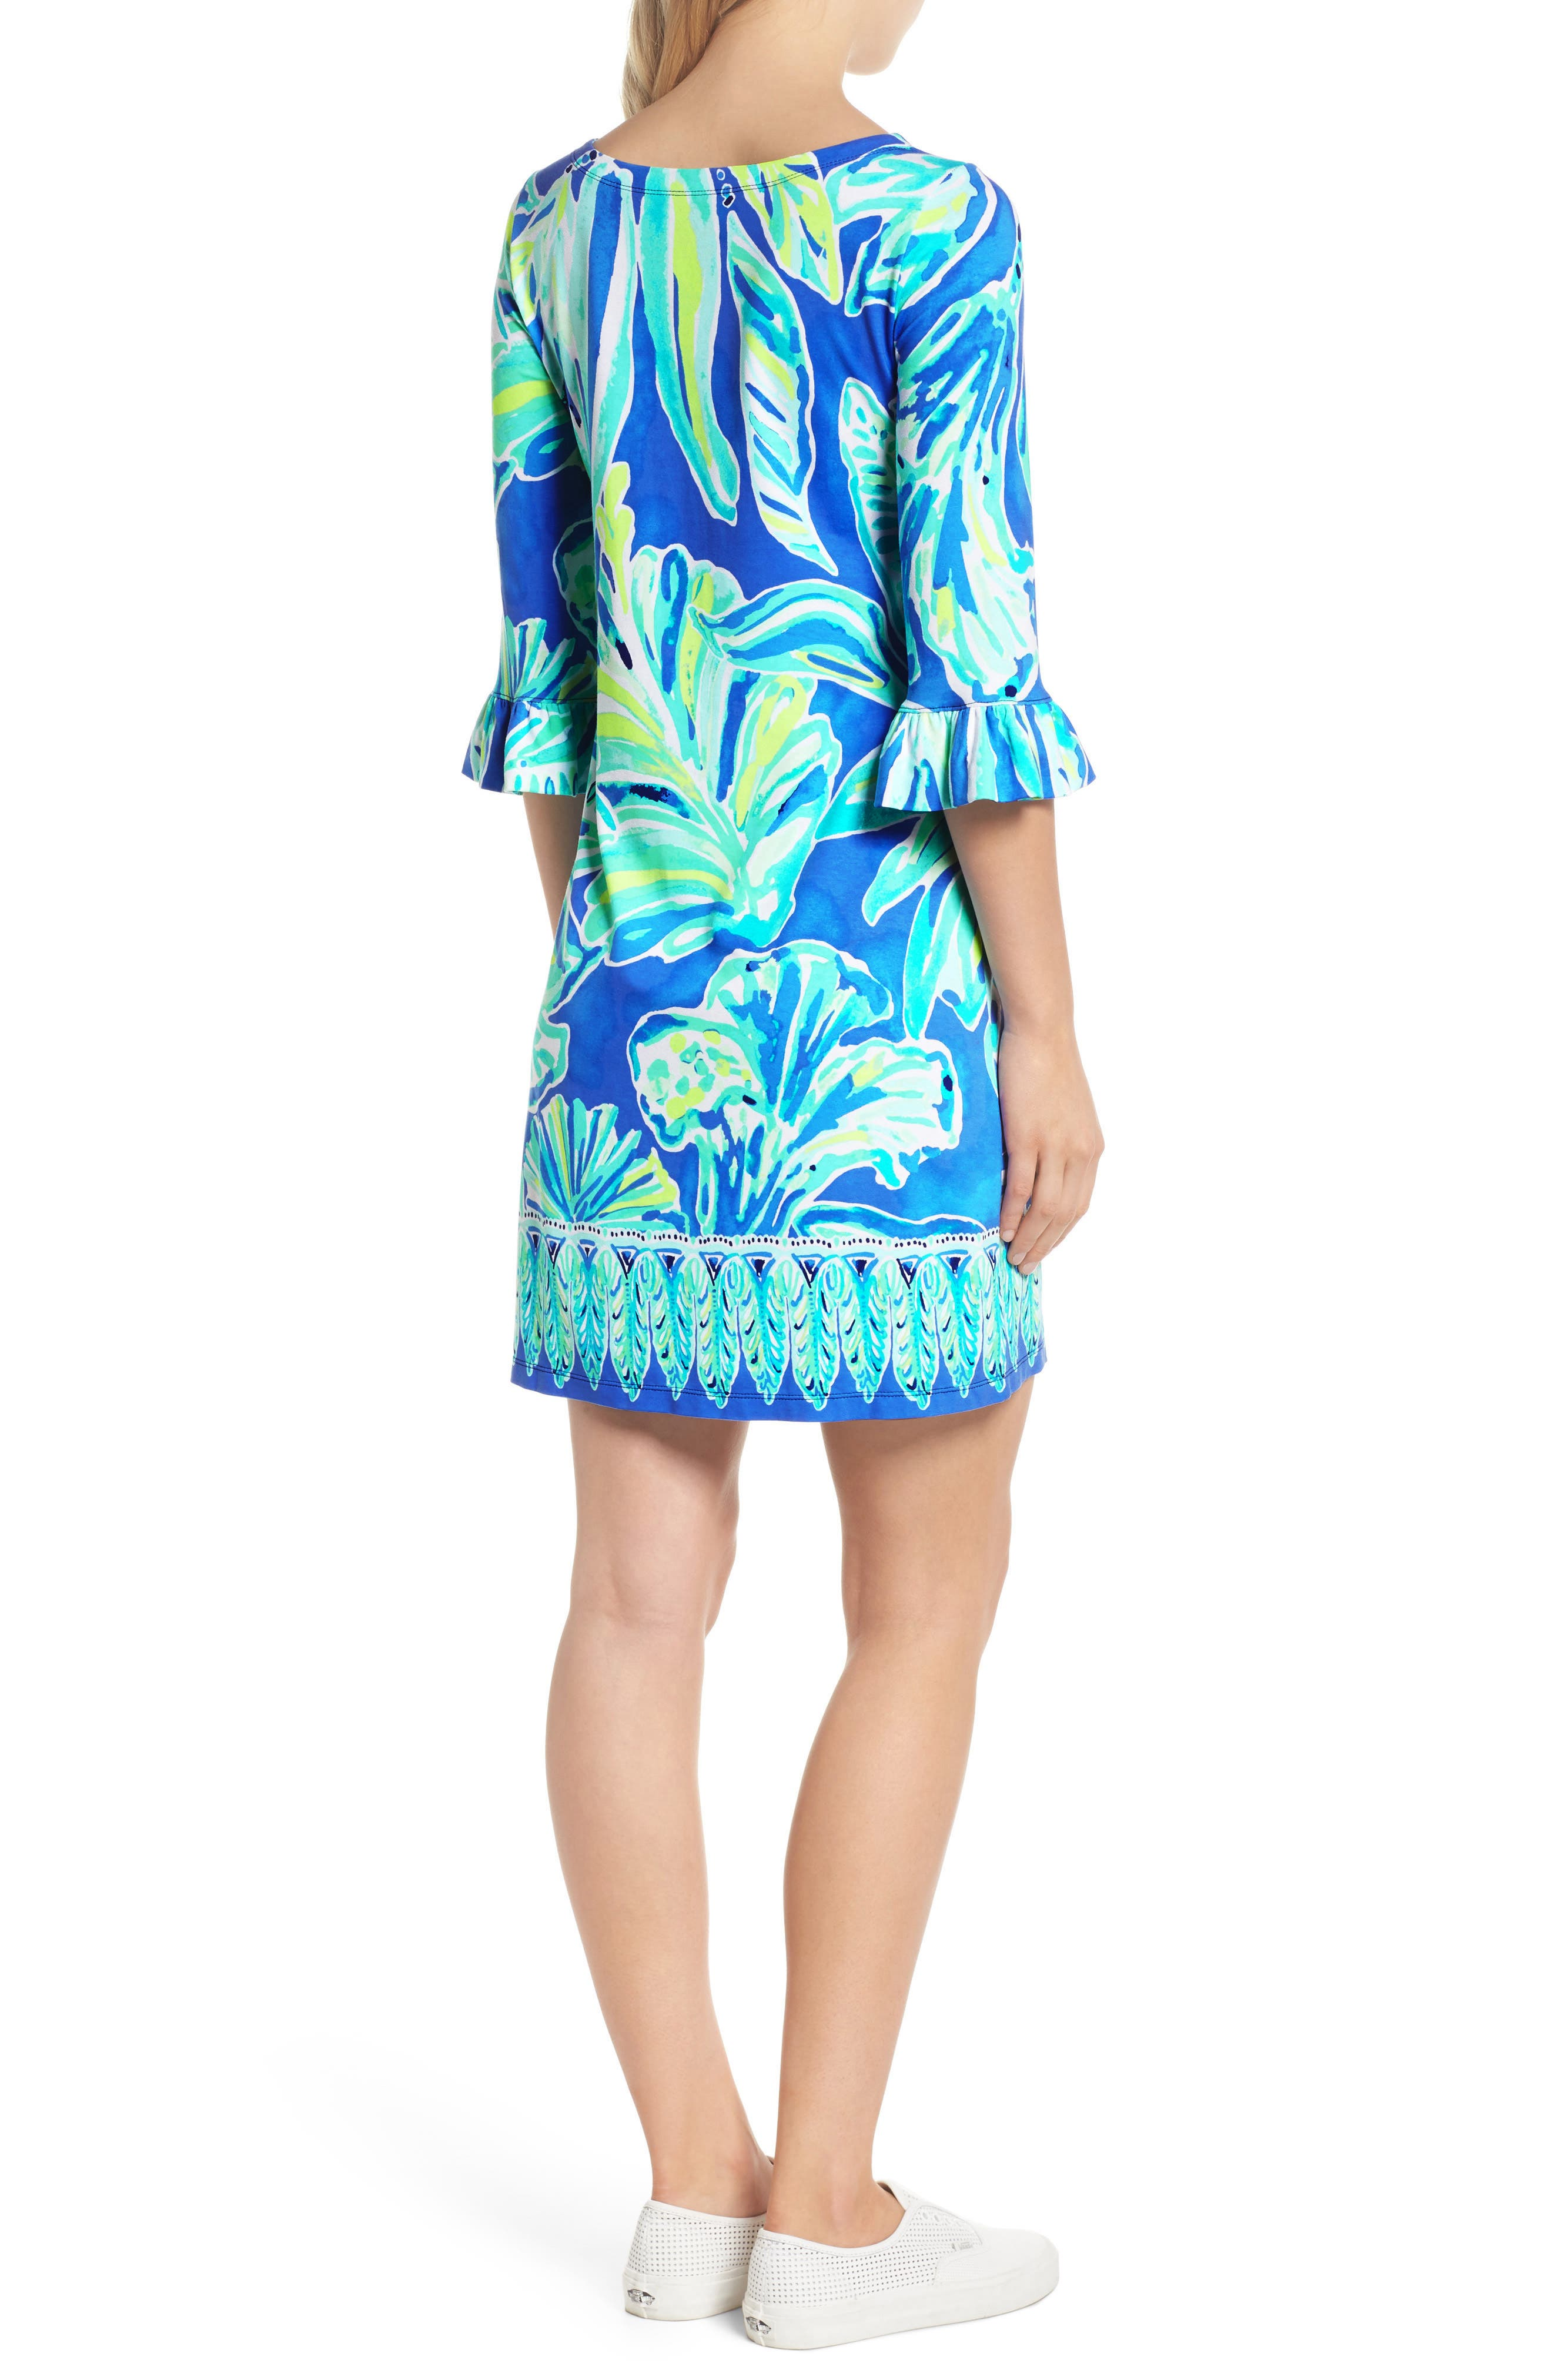 Sophie UPF 50+ Shift Dress,                             Alternate thumbnail 2, color,                             440